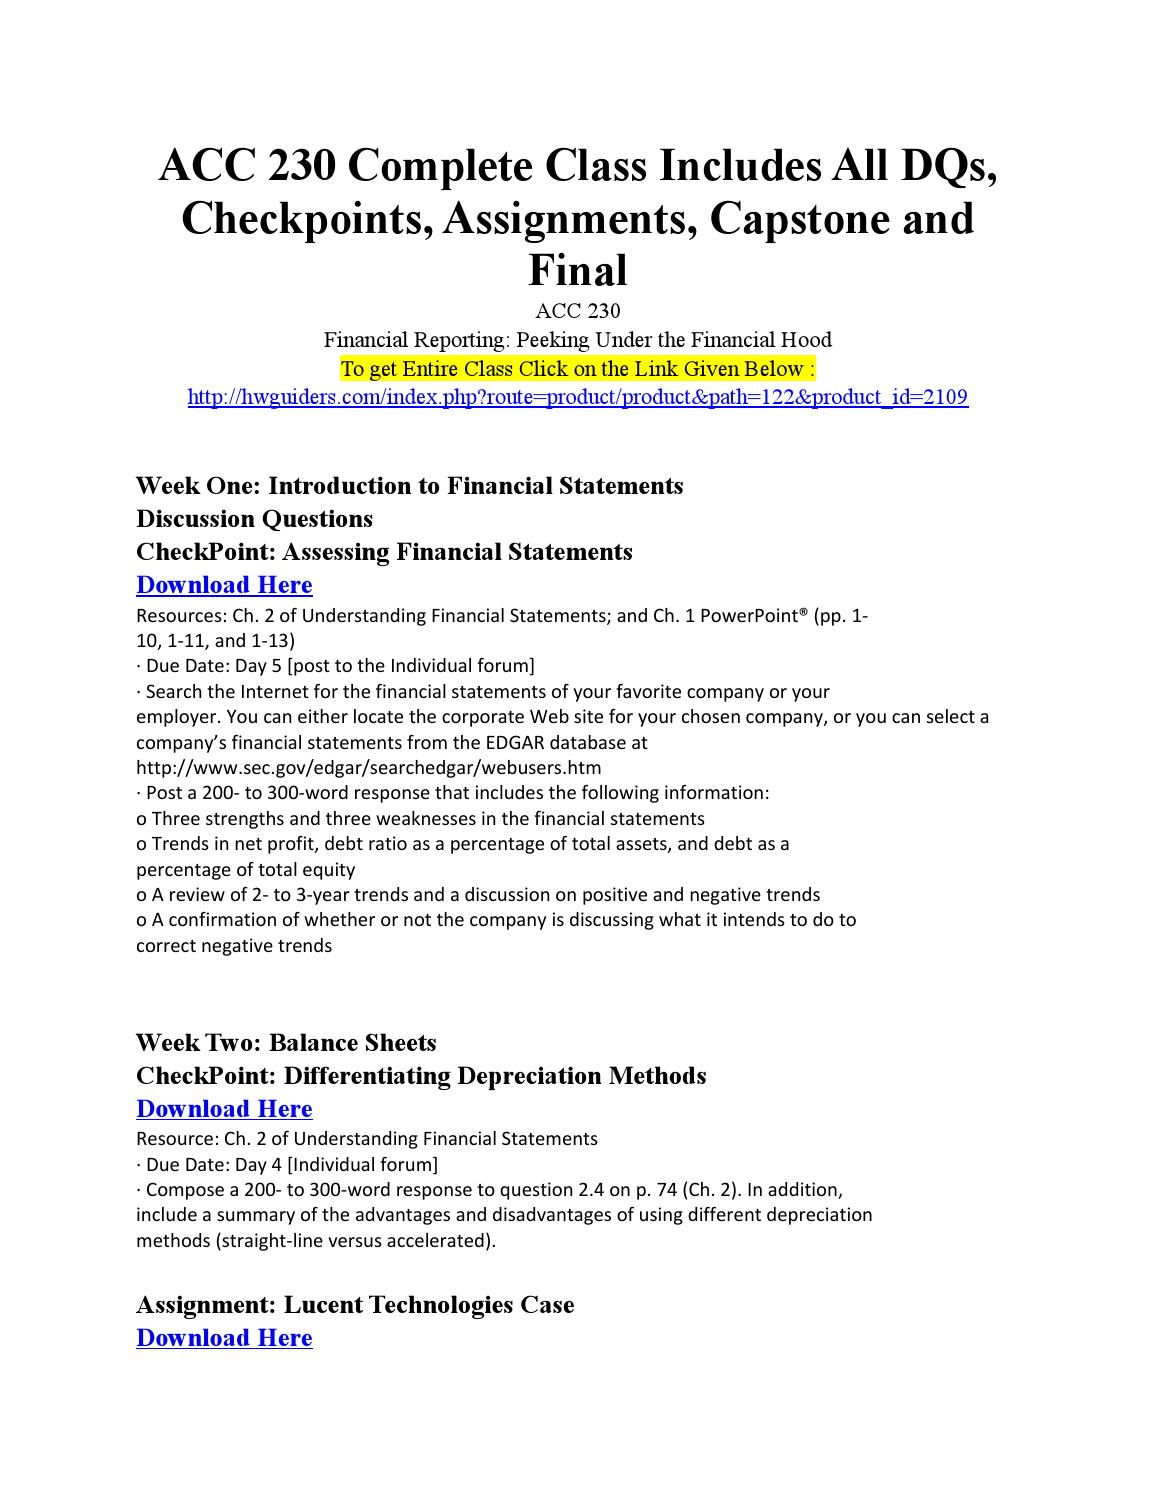 ACC 230 Week 2 Assignment Lucent Technologies Case